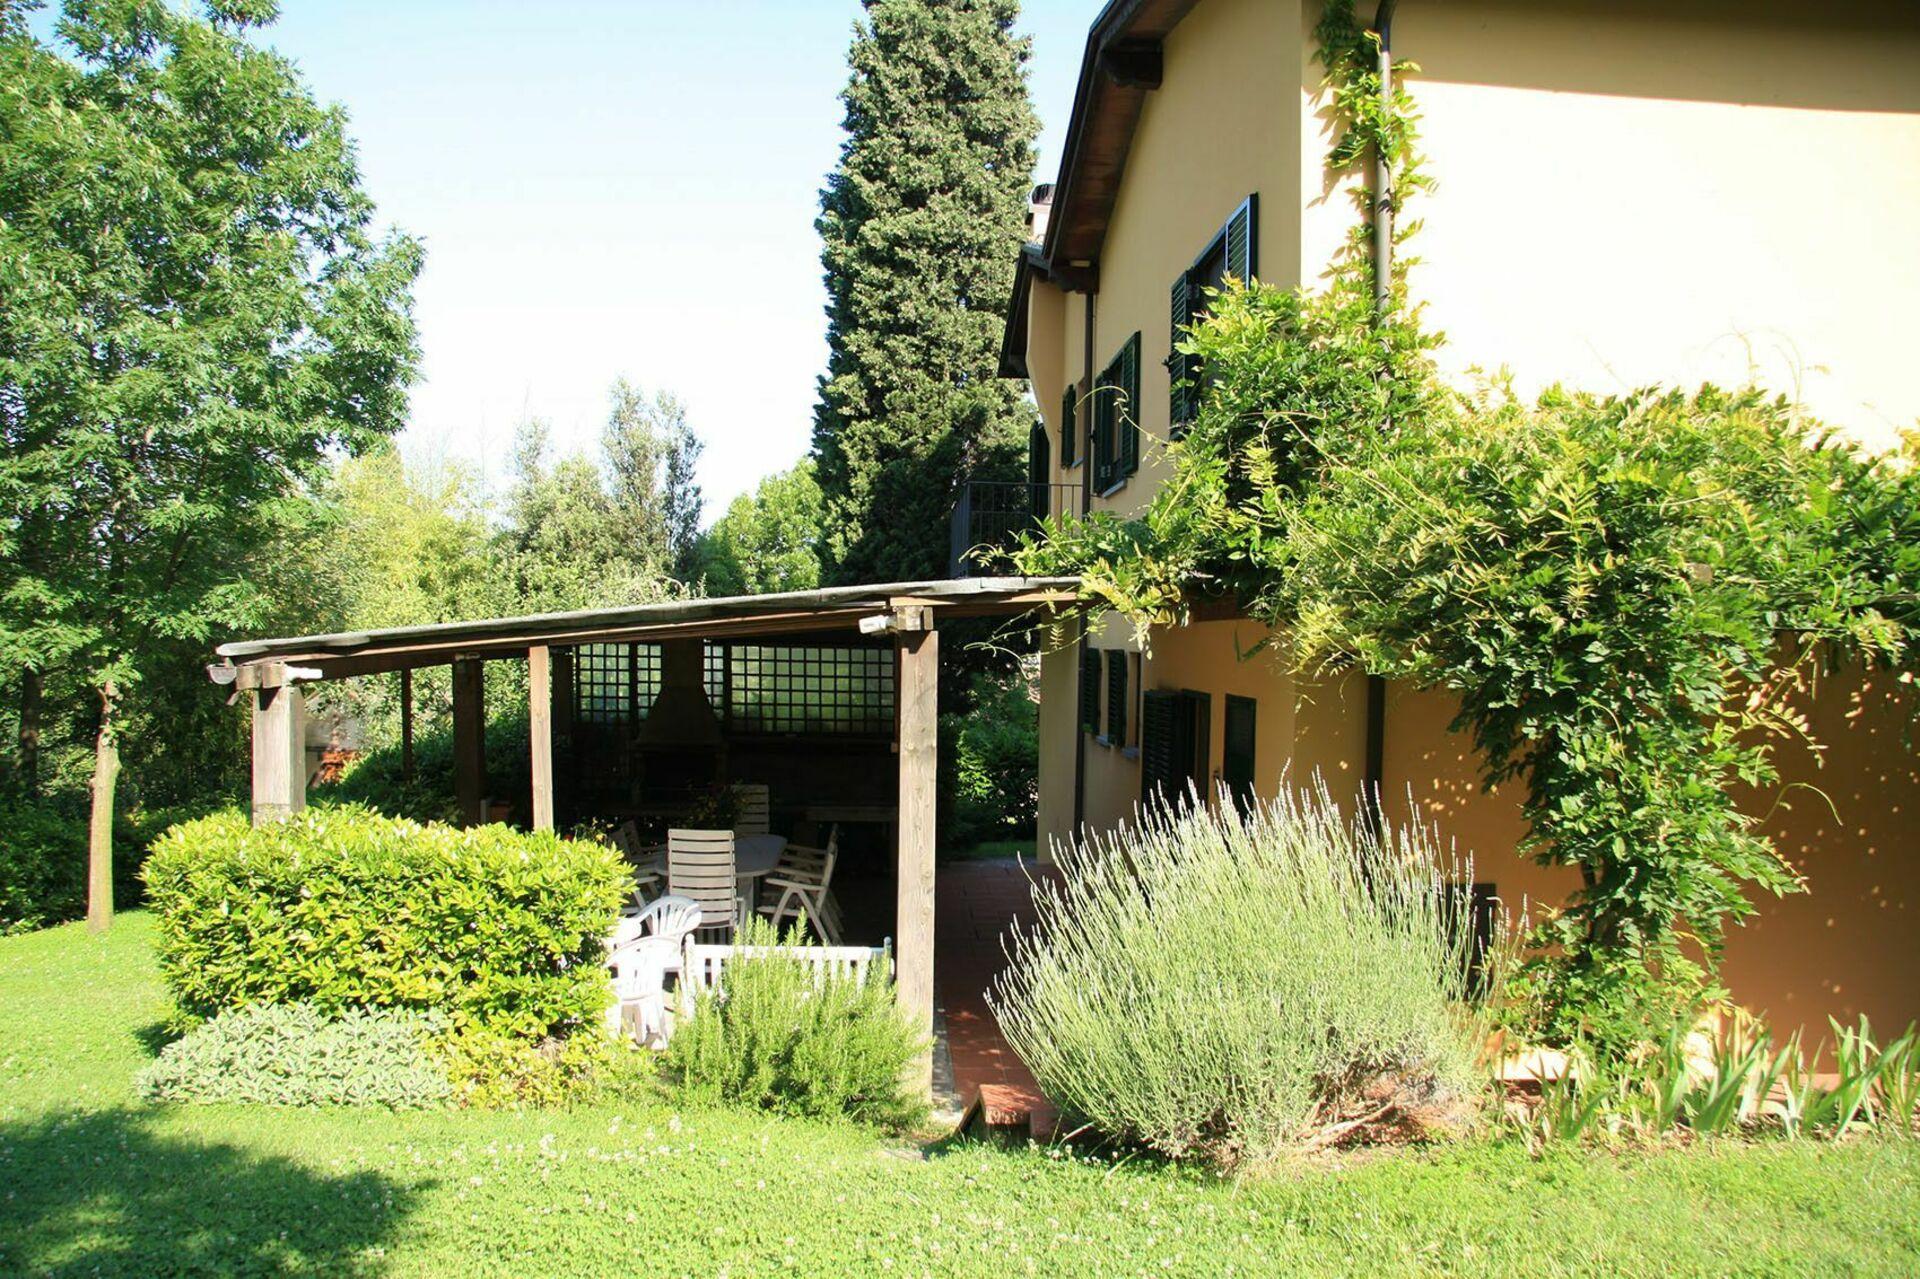 Montecuccoli, Appartamento vacanza a Montelupo Fiorentino, Toscana ...